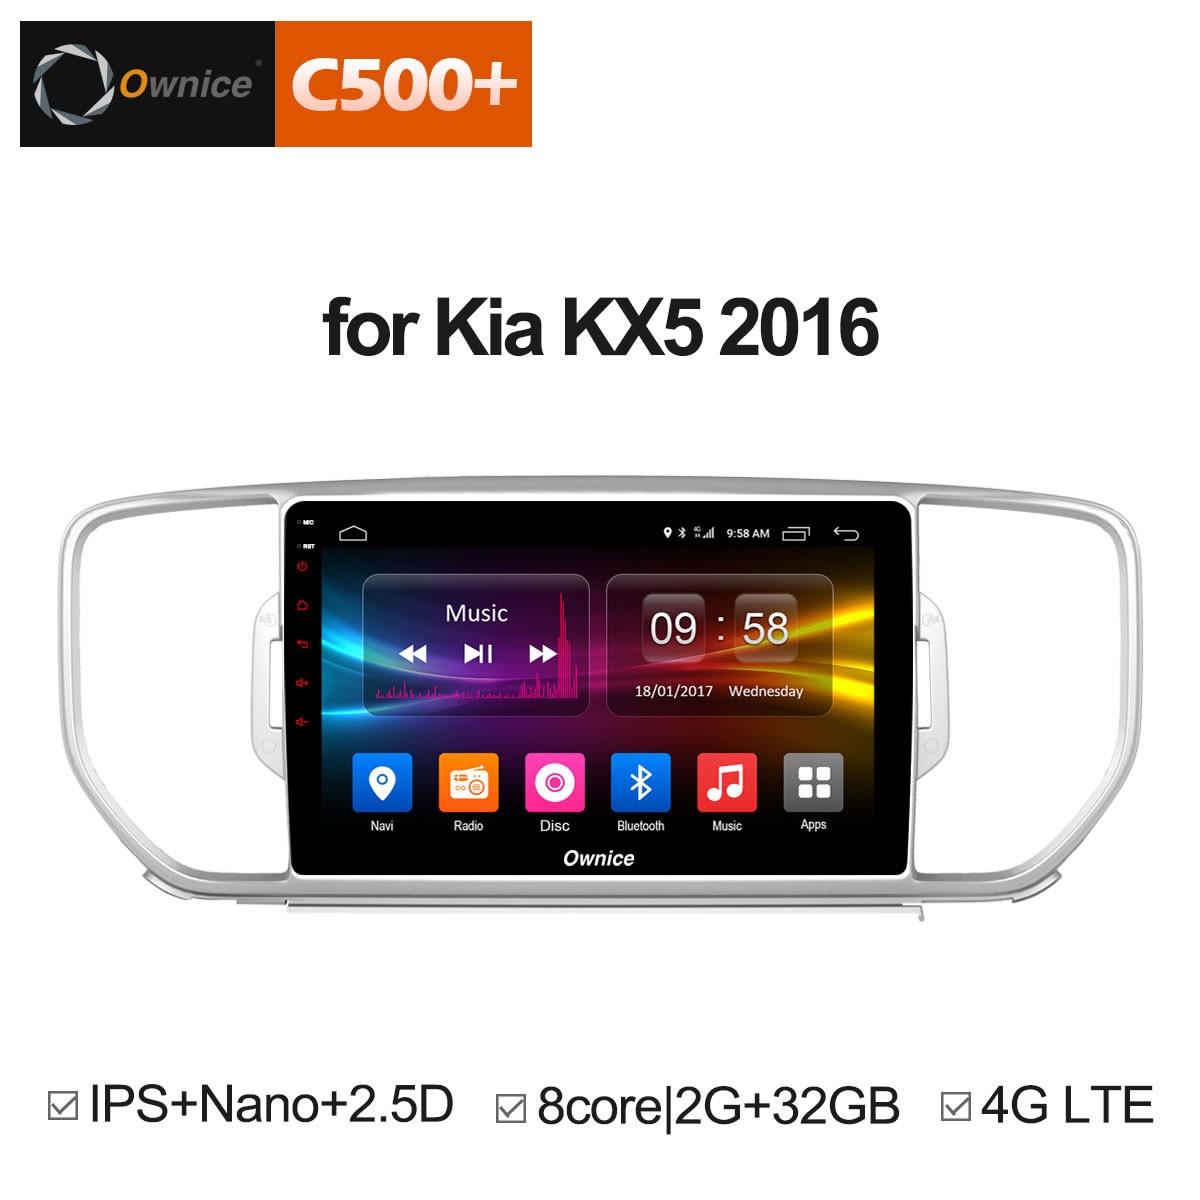 Ownice C500+ G10 Android 8.1 eight Core For KIA Sportage KX5 2016 Car Radio Navi GPS player 2GB RAM 32GB ROM Support 4G DVD автомобильный dvd плеер hotaudio 4 4 4 kia sportage 2010 dvd gps navi dhl ems